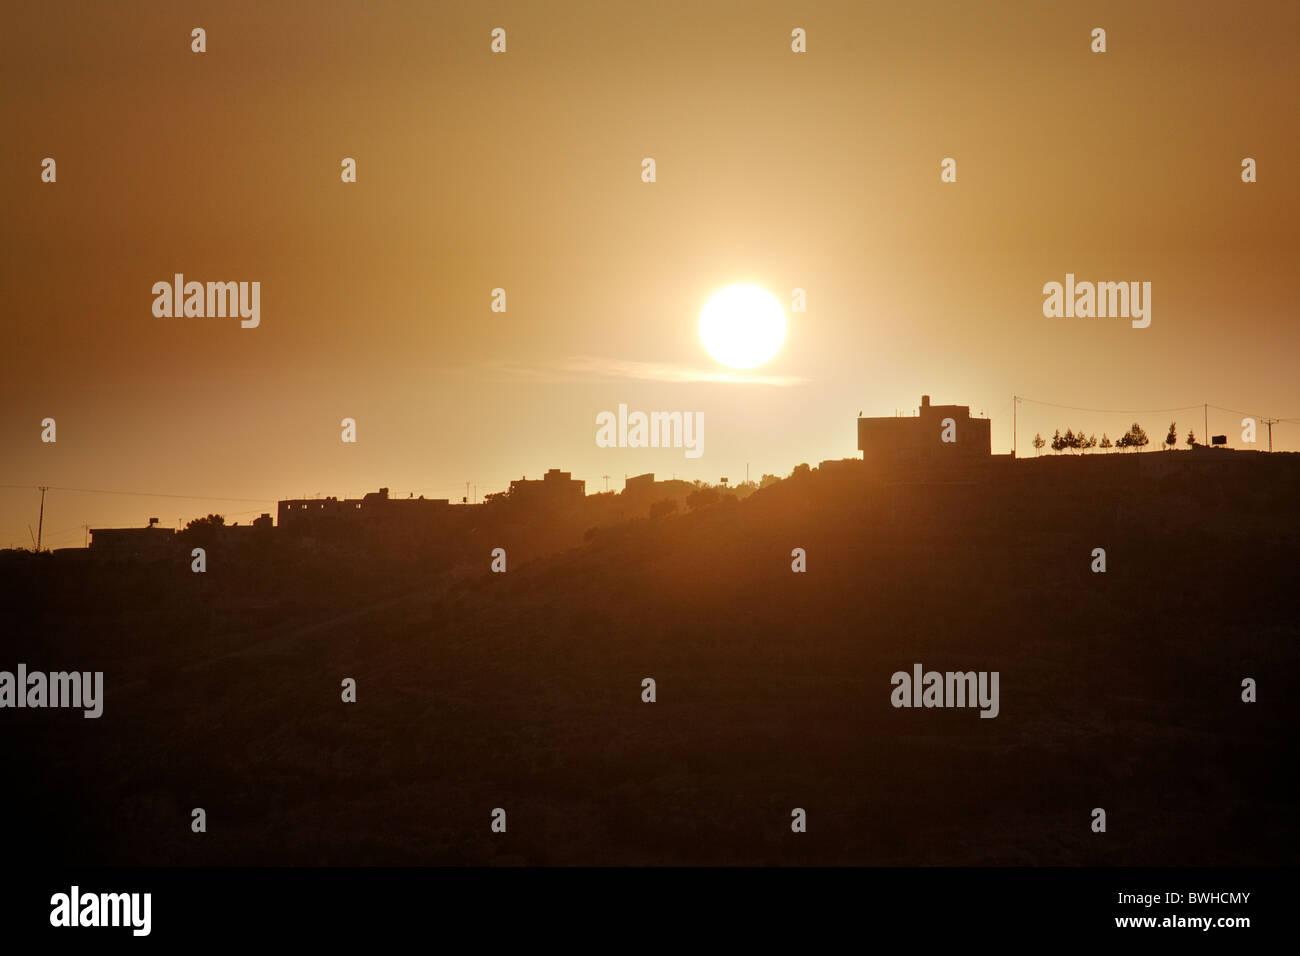 A palestinan village on a hill - Stock Image